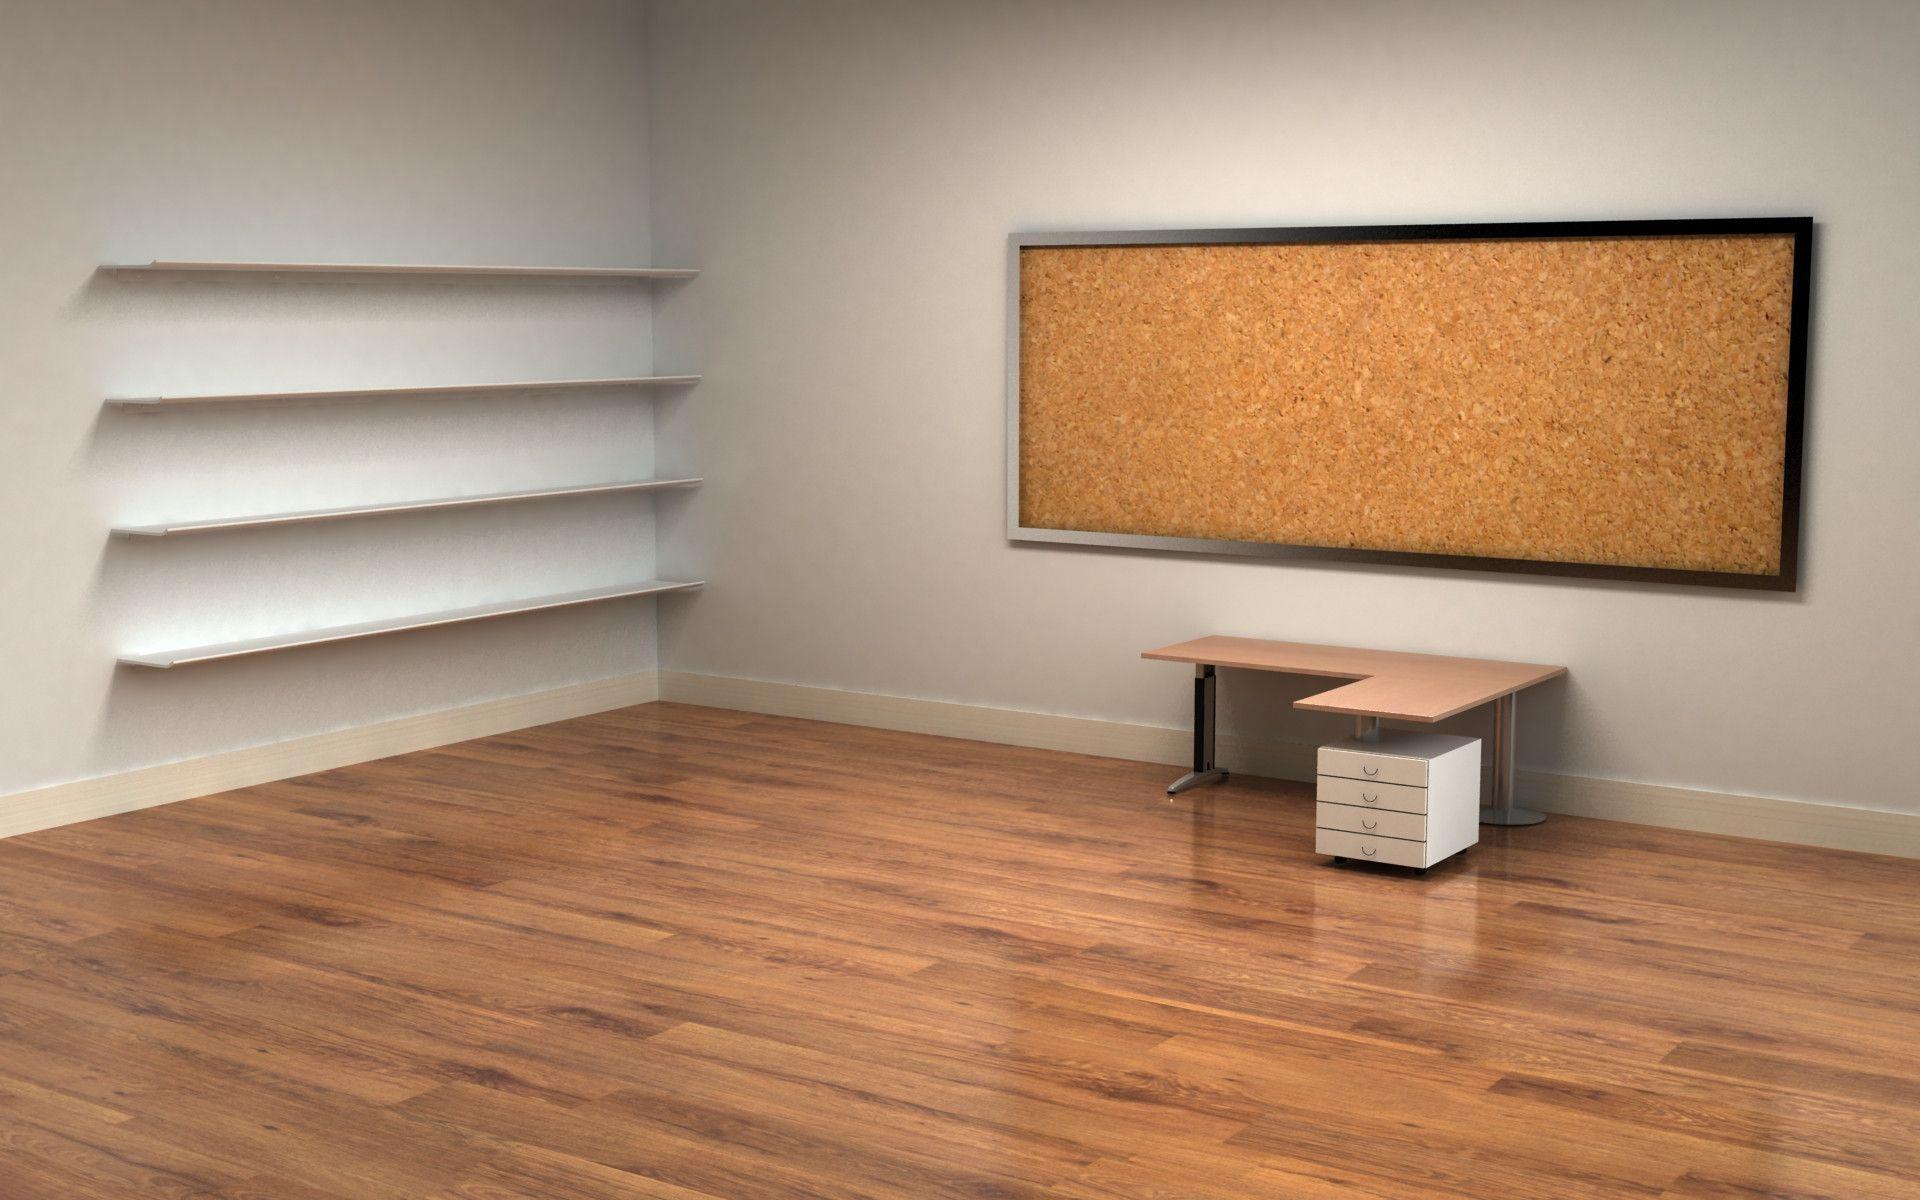 Shelf Desktop Wallpapers